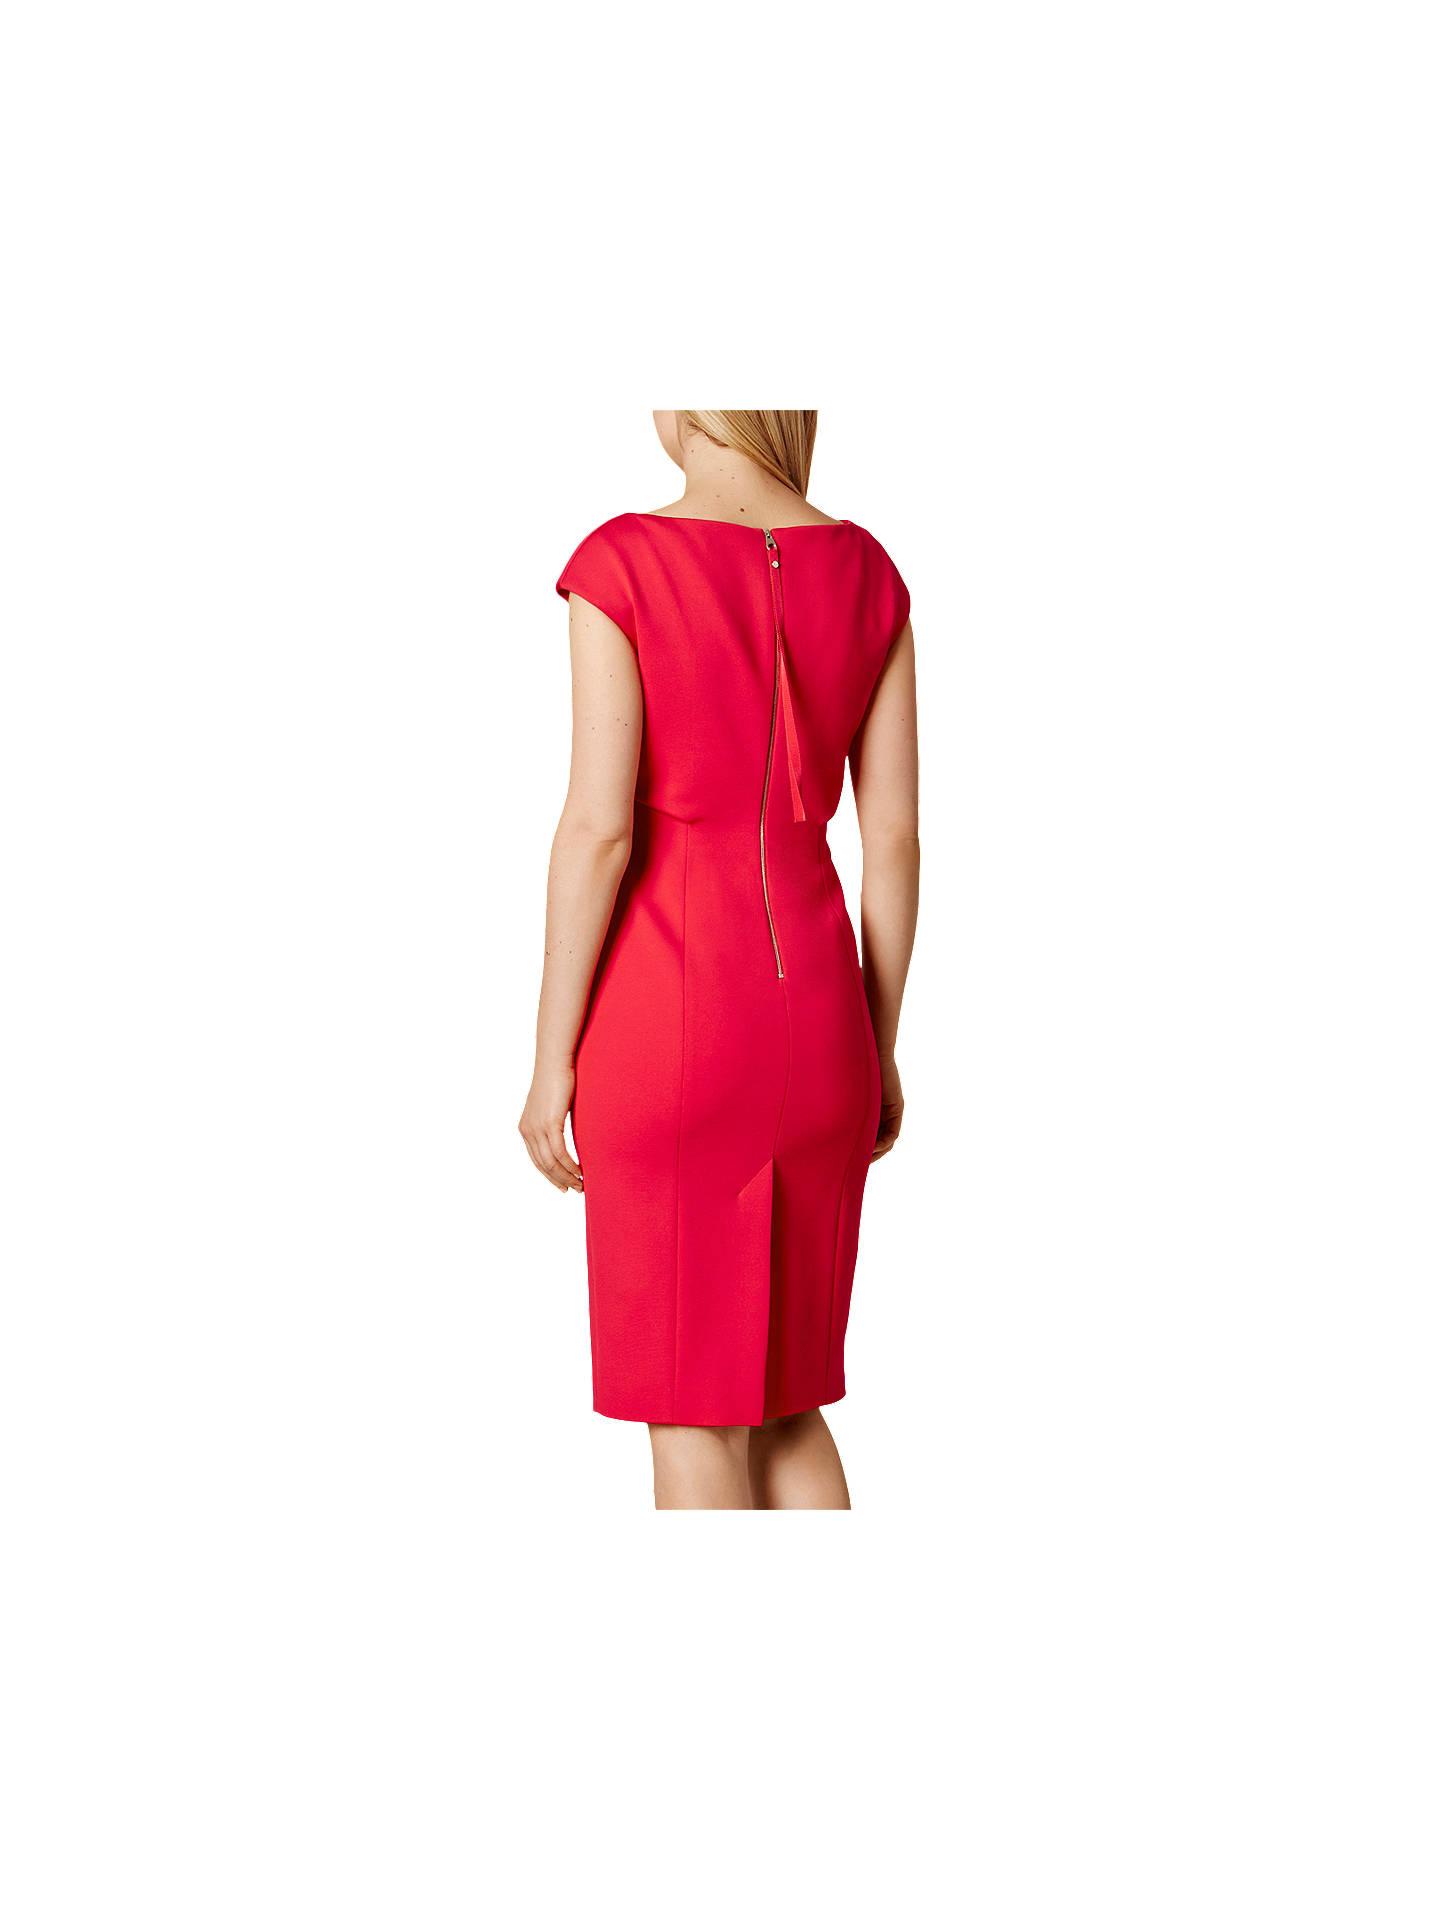 Karen Millen Double Layer Collection Dress, Pink at John Lewis ...